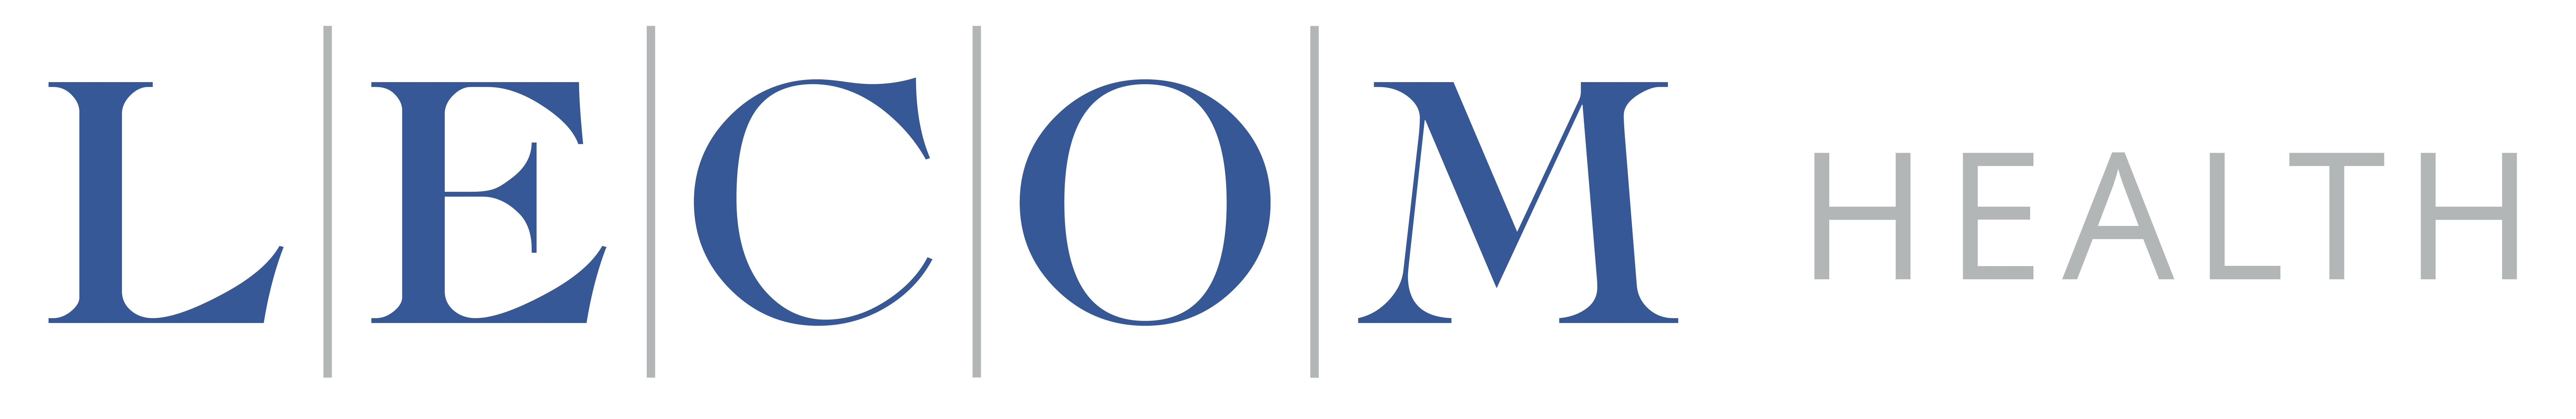 LECOM Health Master Logo(Uncoated)_Rectangle